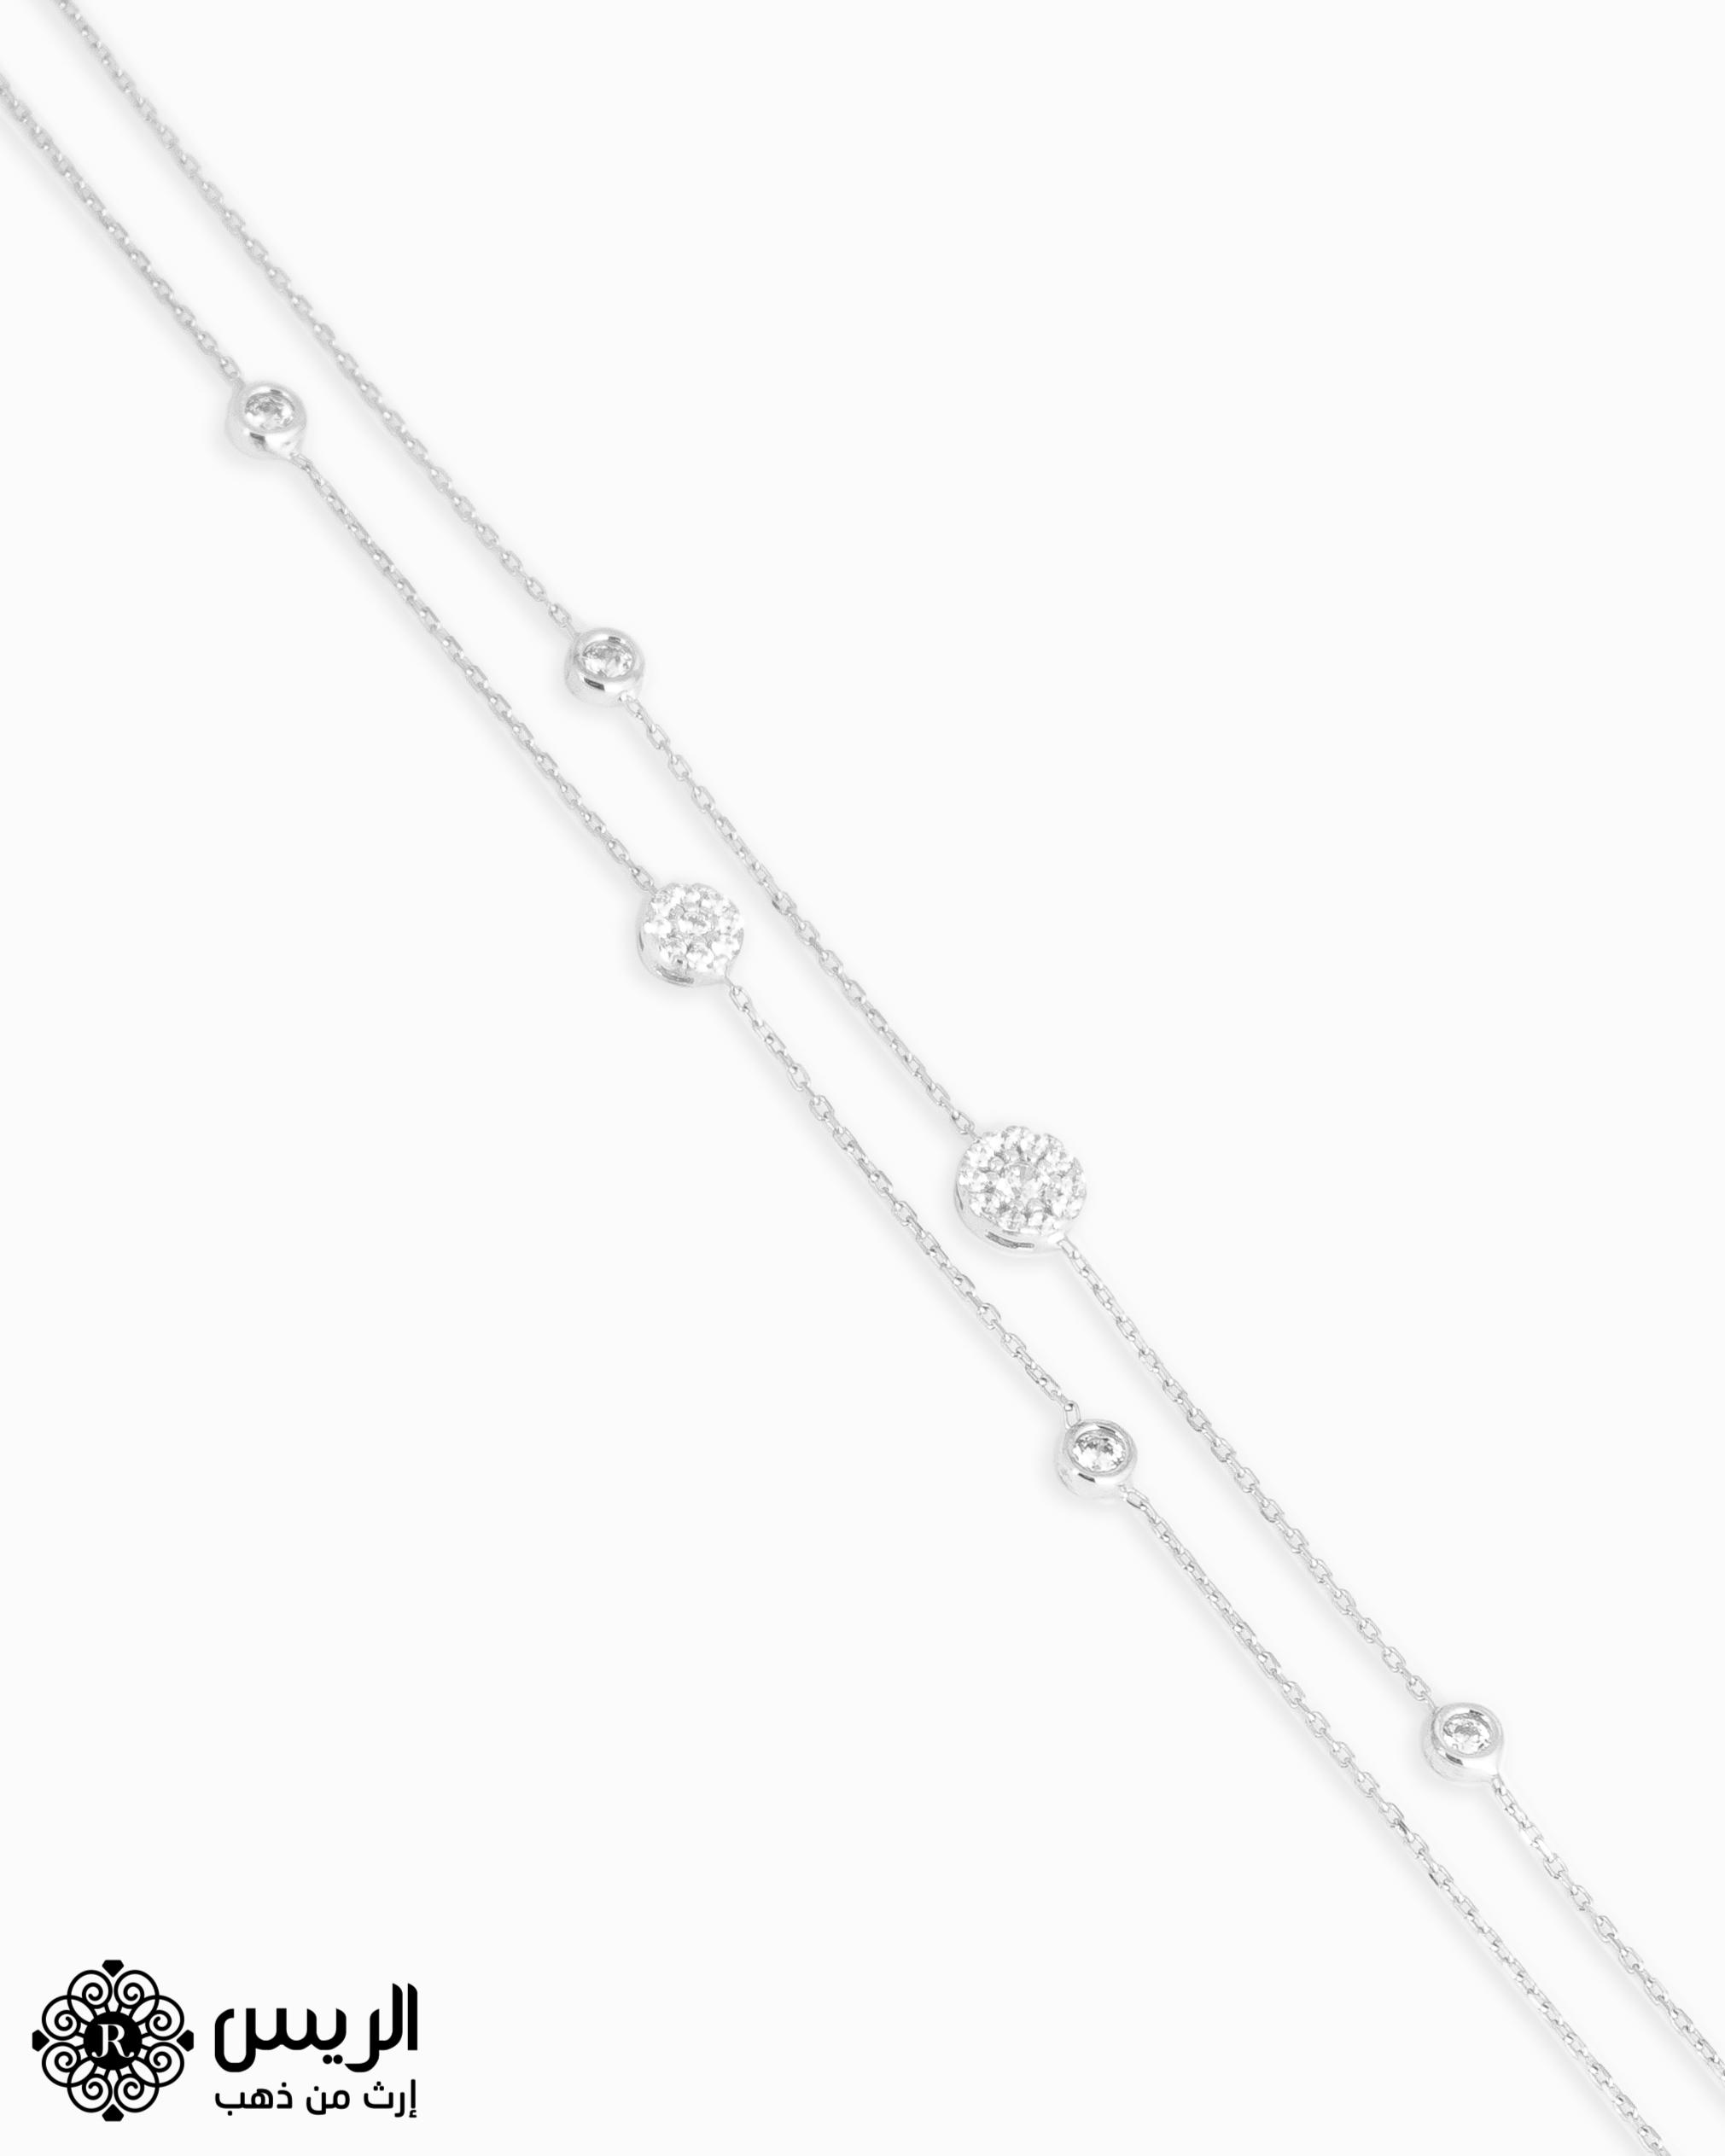 Raies jewelry Delicate Bracelet إسورة (إنسيالة) ناعمة الريس للمجوهرات